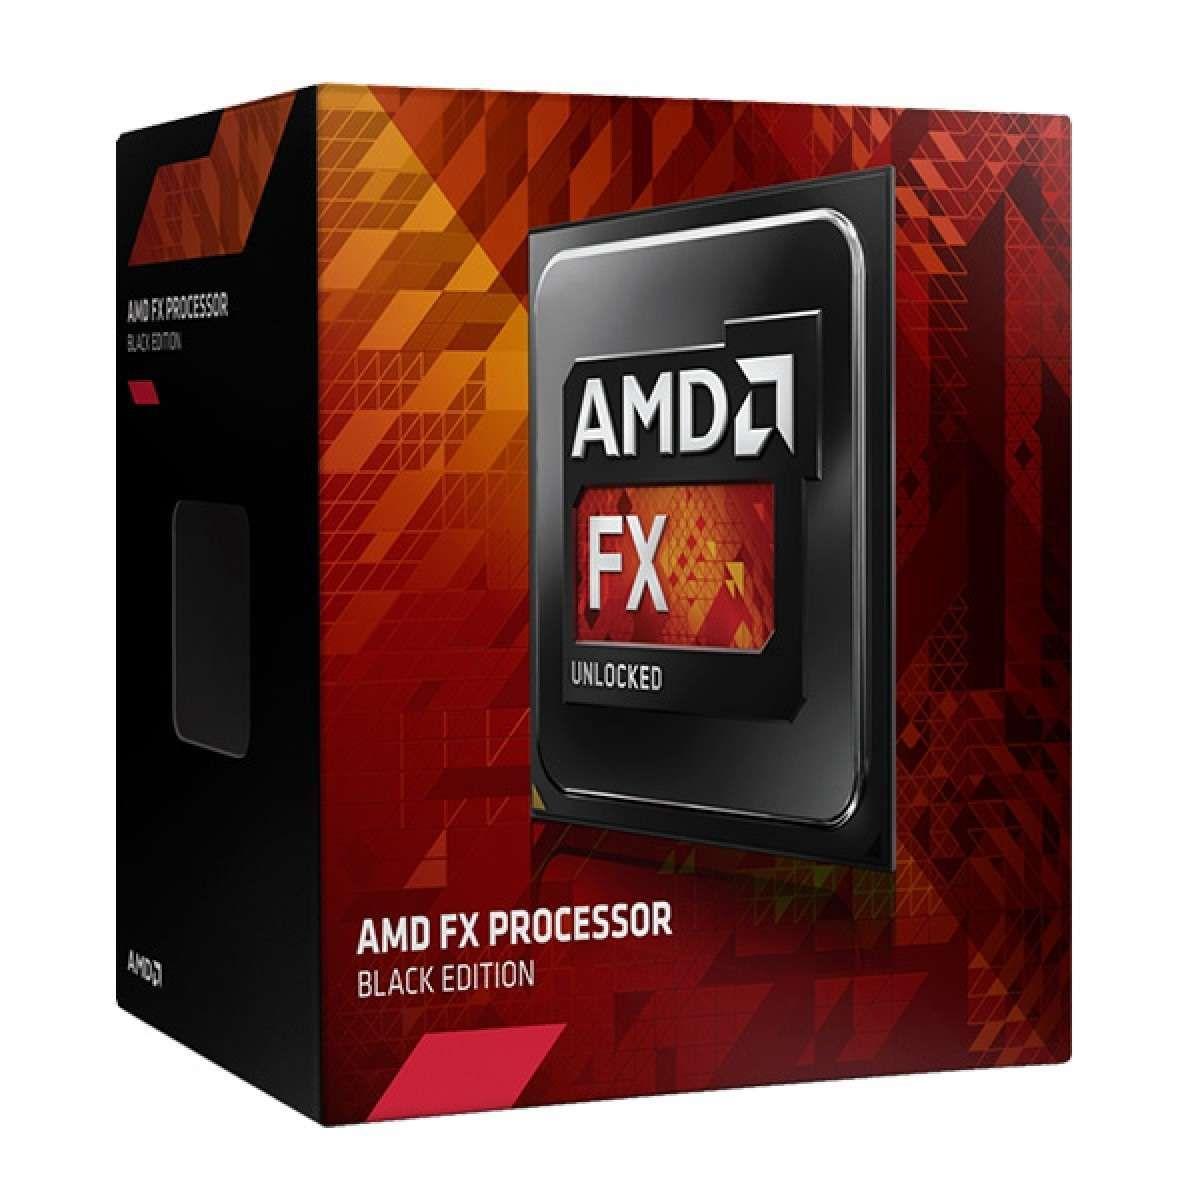 Processador AMD FX 8300 Octa Core, Black Edition, Cache 16MB, 3.3GHz AM3+ FD8300WMHKBOX